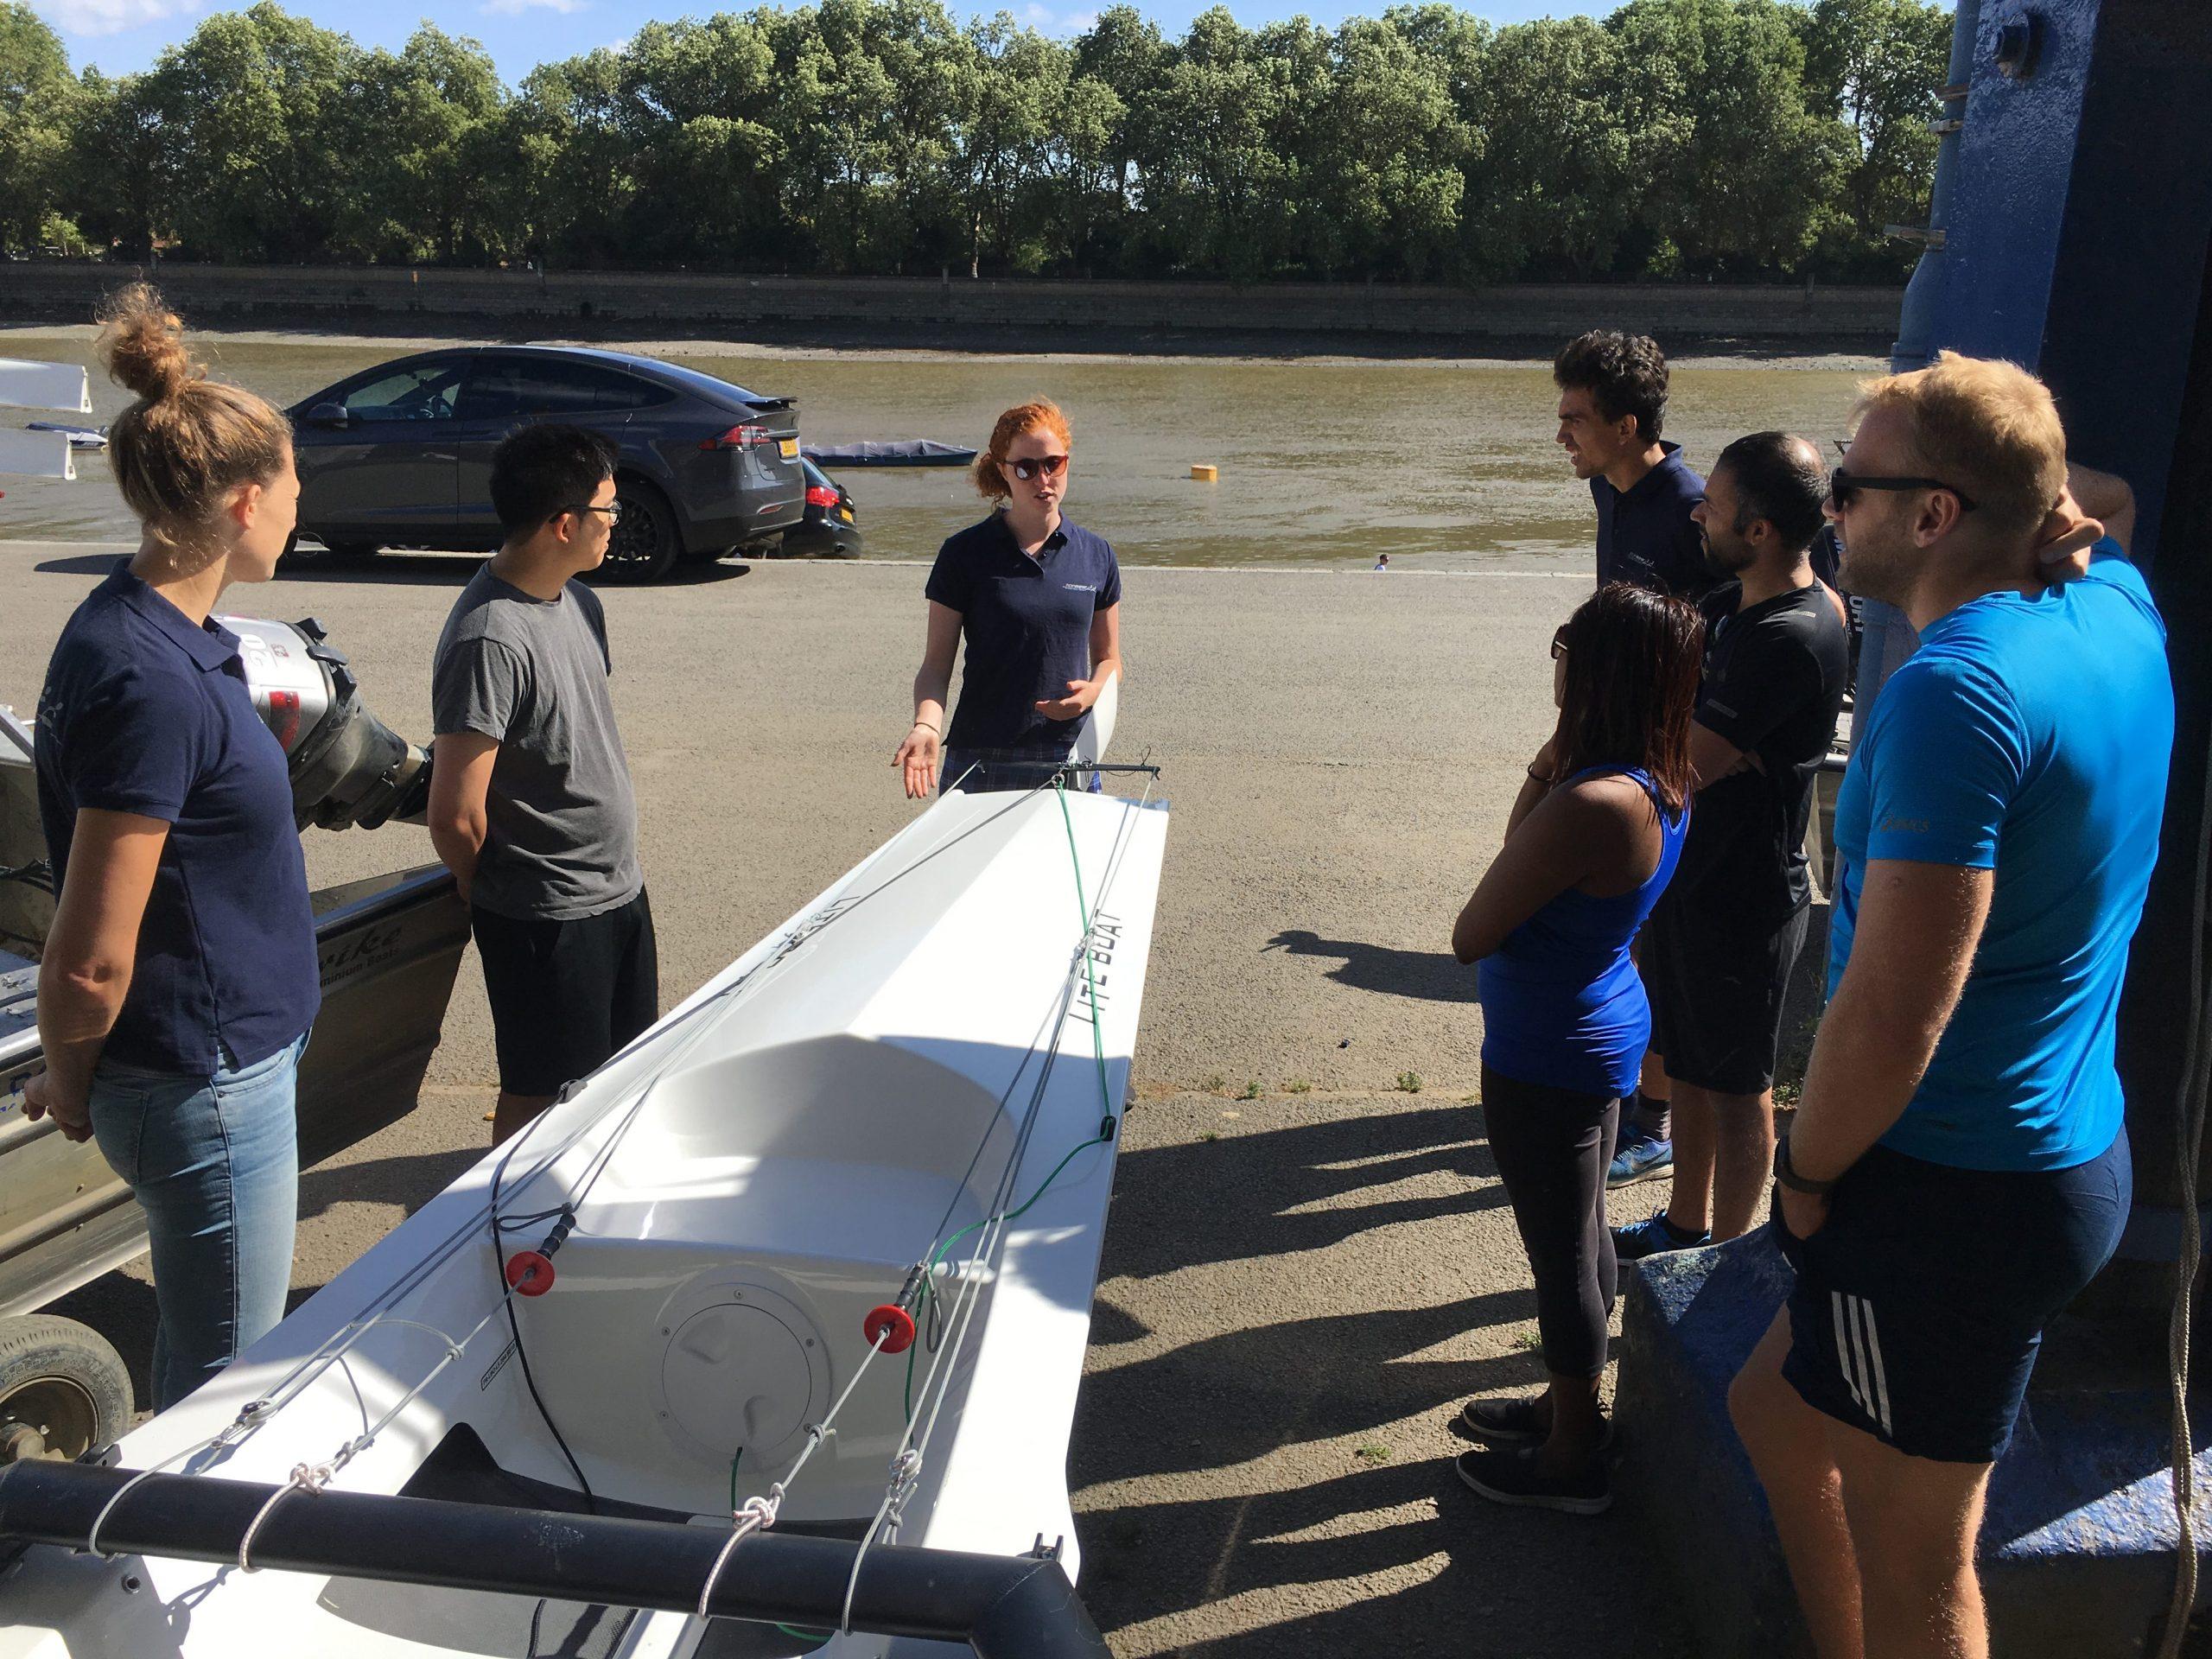 Rowing coaching at TopRow London: 'We were pioneers'